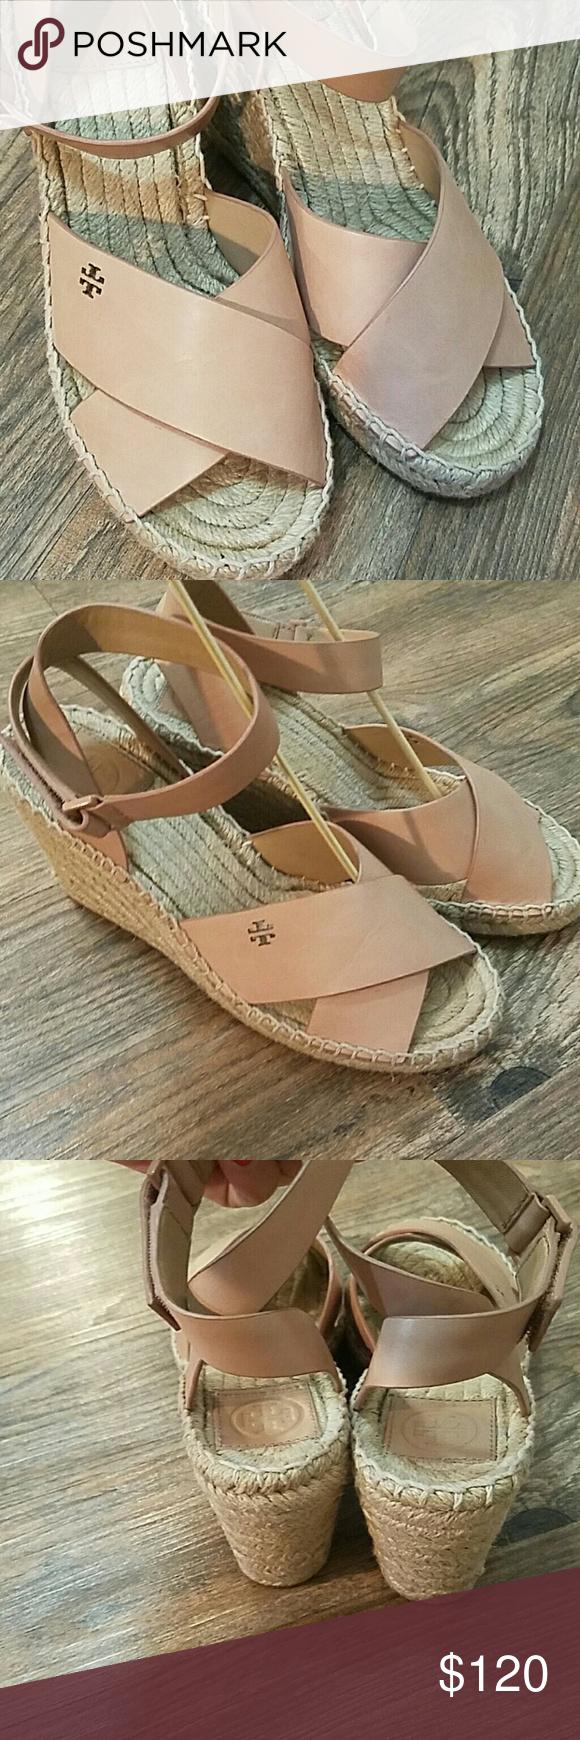 05269eea3bb Tory Burch Shoes | Tory Burch Bima Espadrille Wedge Sandal | Color ...